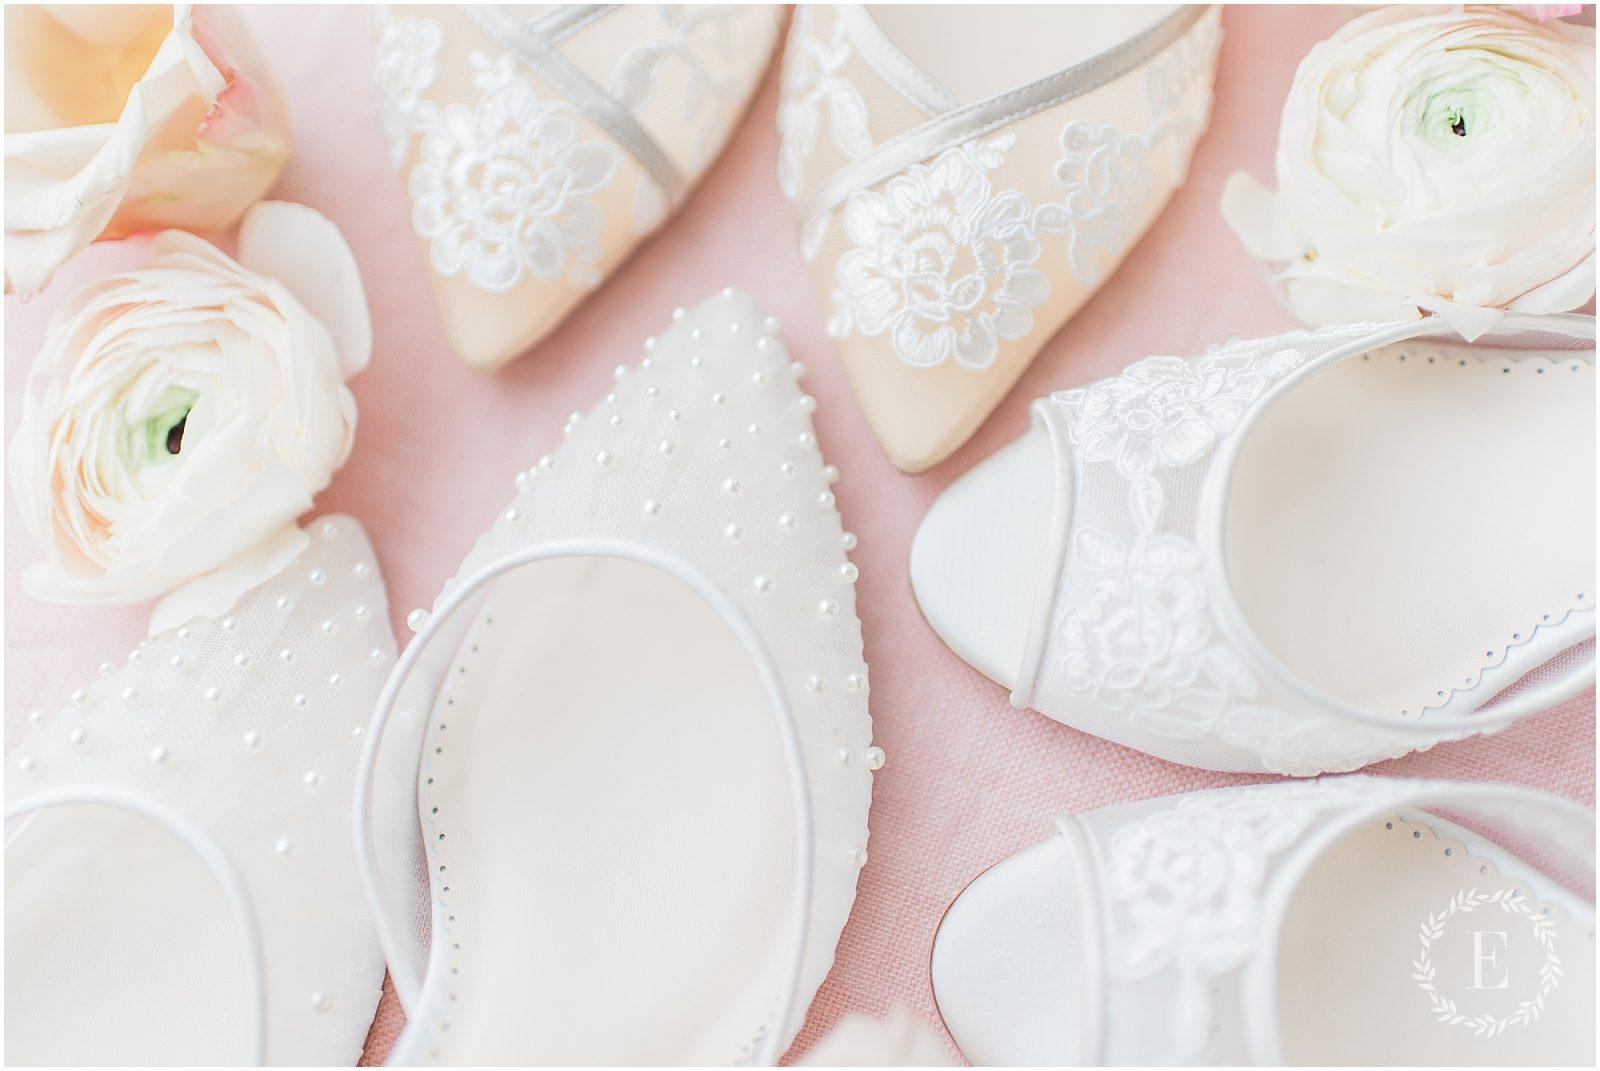 26 - Bella Belle for Fairy Dreams Bridal - PhotosbyEmmaH 2019.jpg